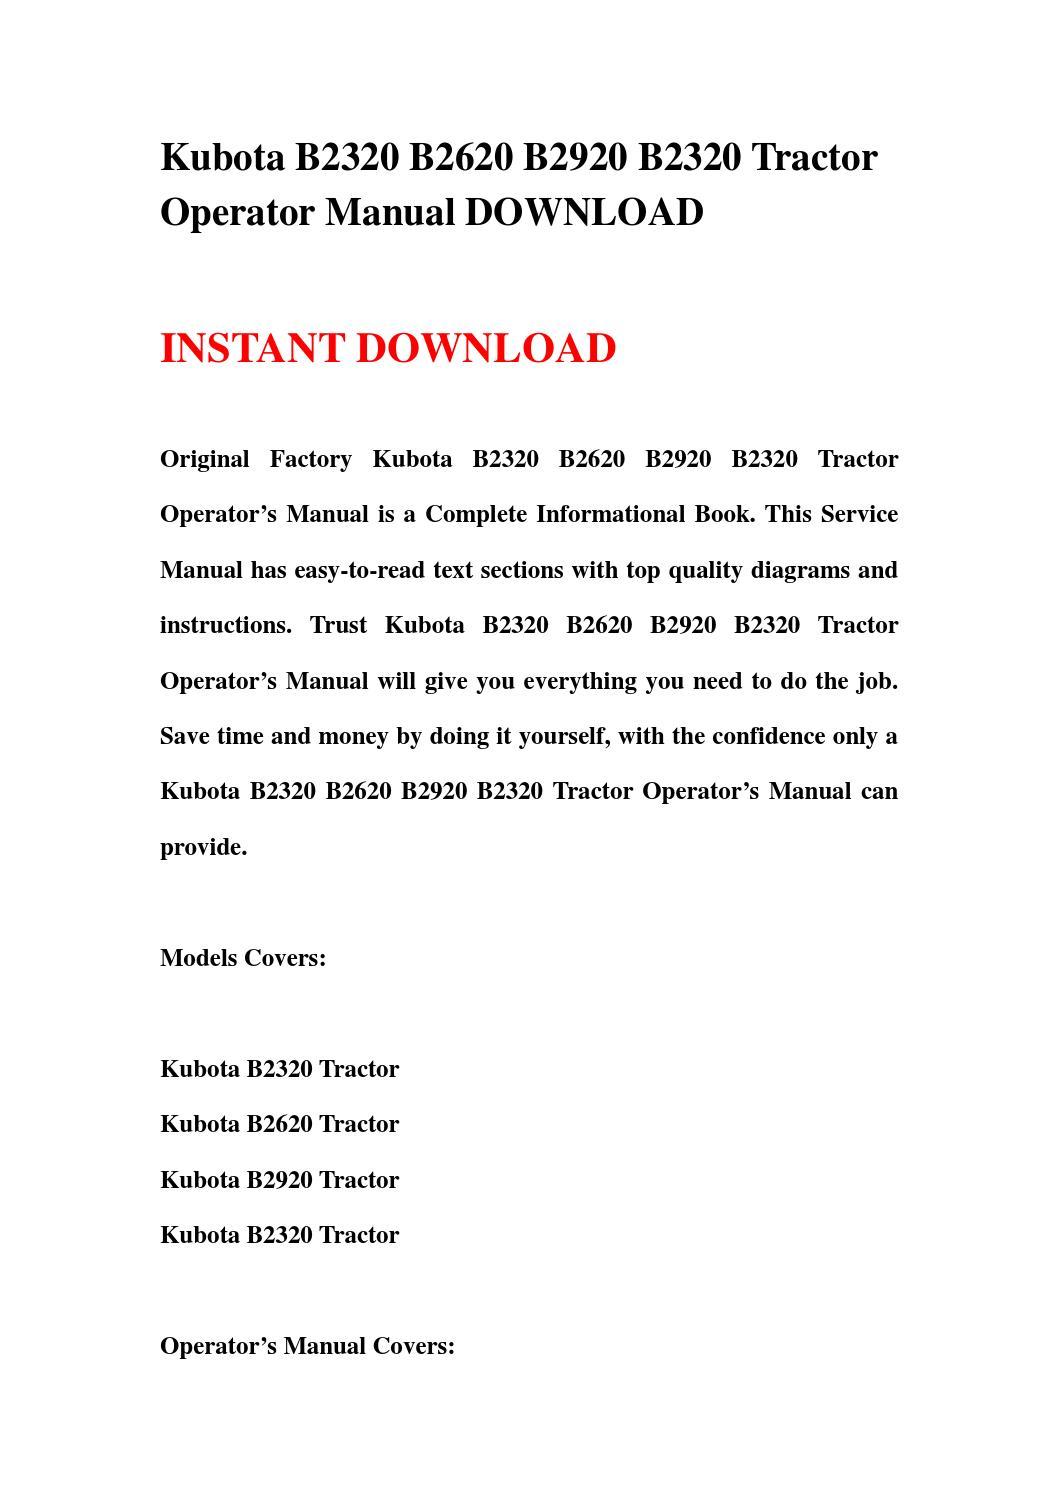 Kubota B2620 Diagram Block And Schematic Diagrams \u2022 Kubota Fender Wiring  Diagram Kubota B2920 Problems